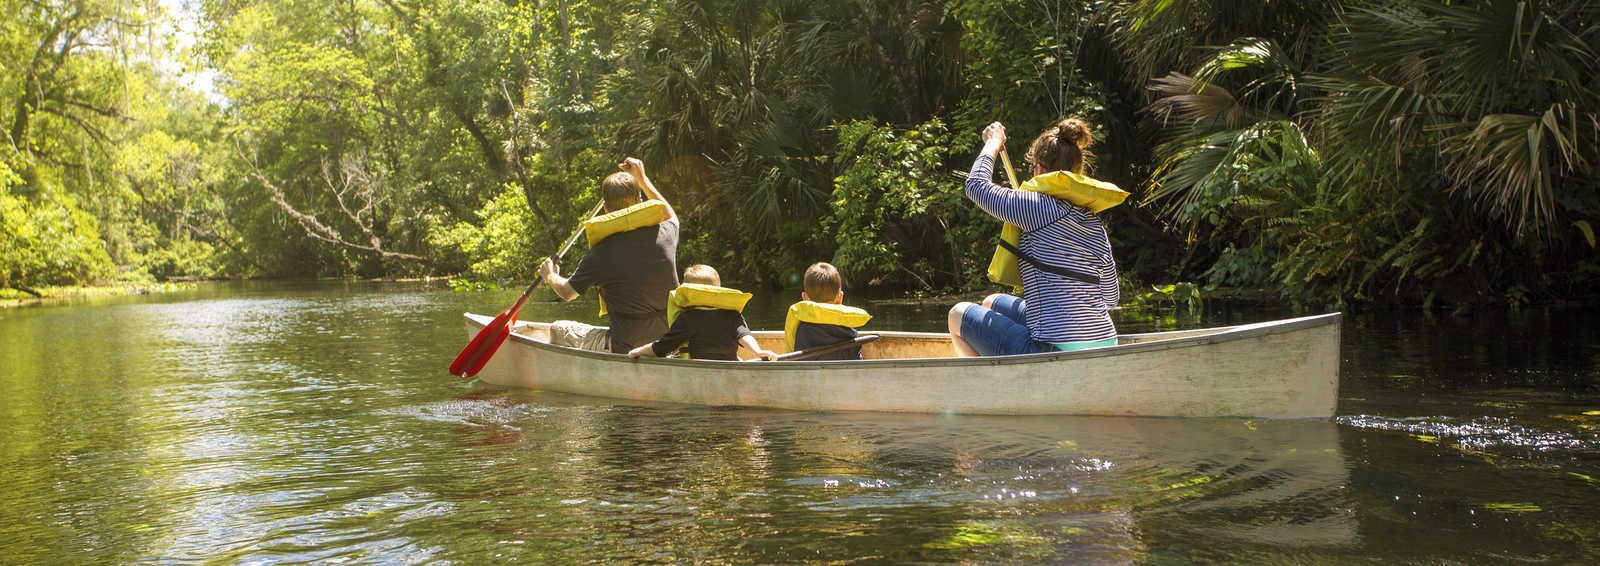 Family canoe ride down a beautiful tropical river